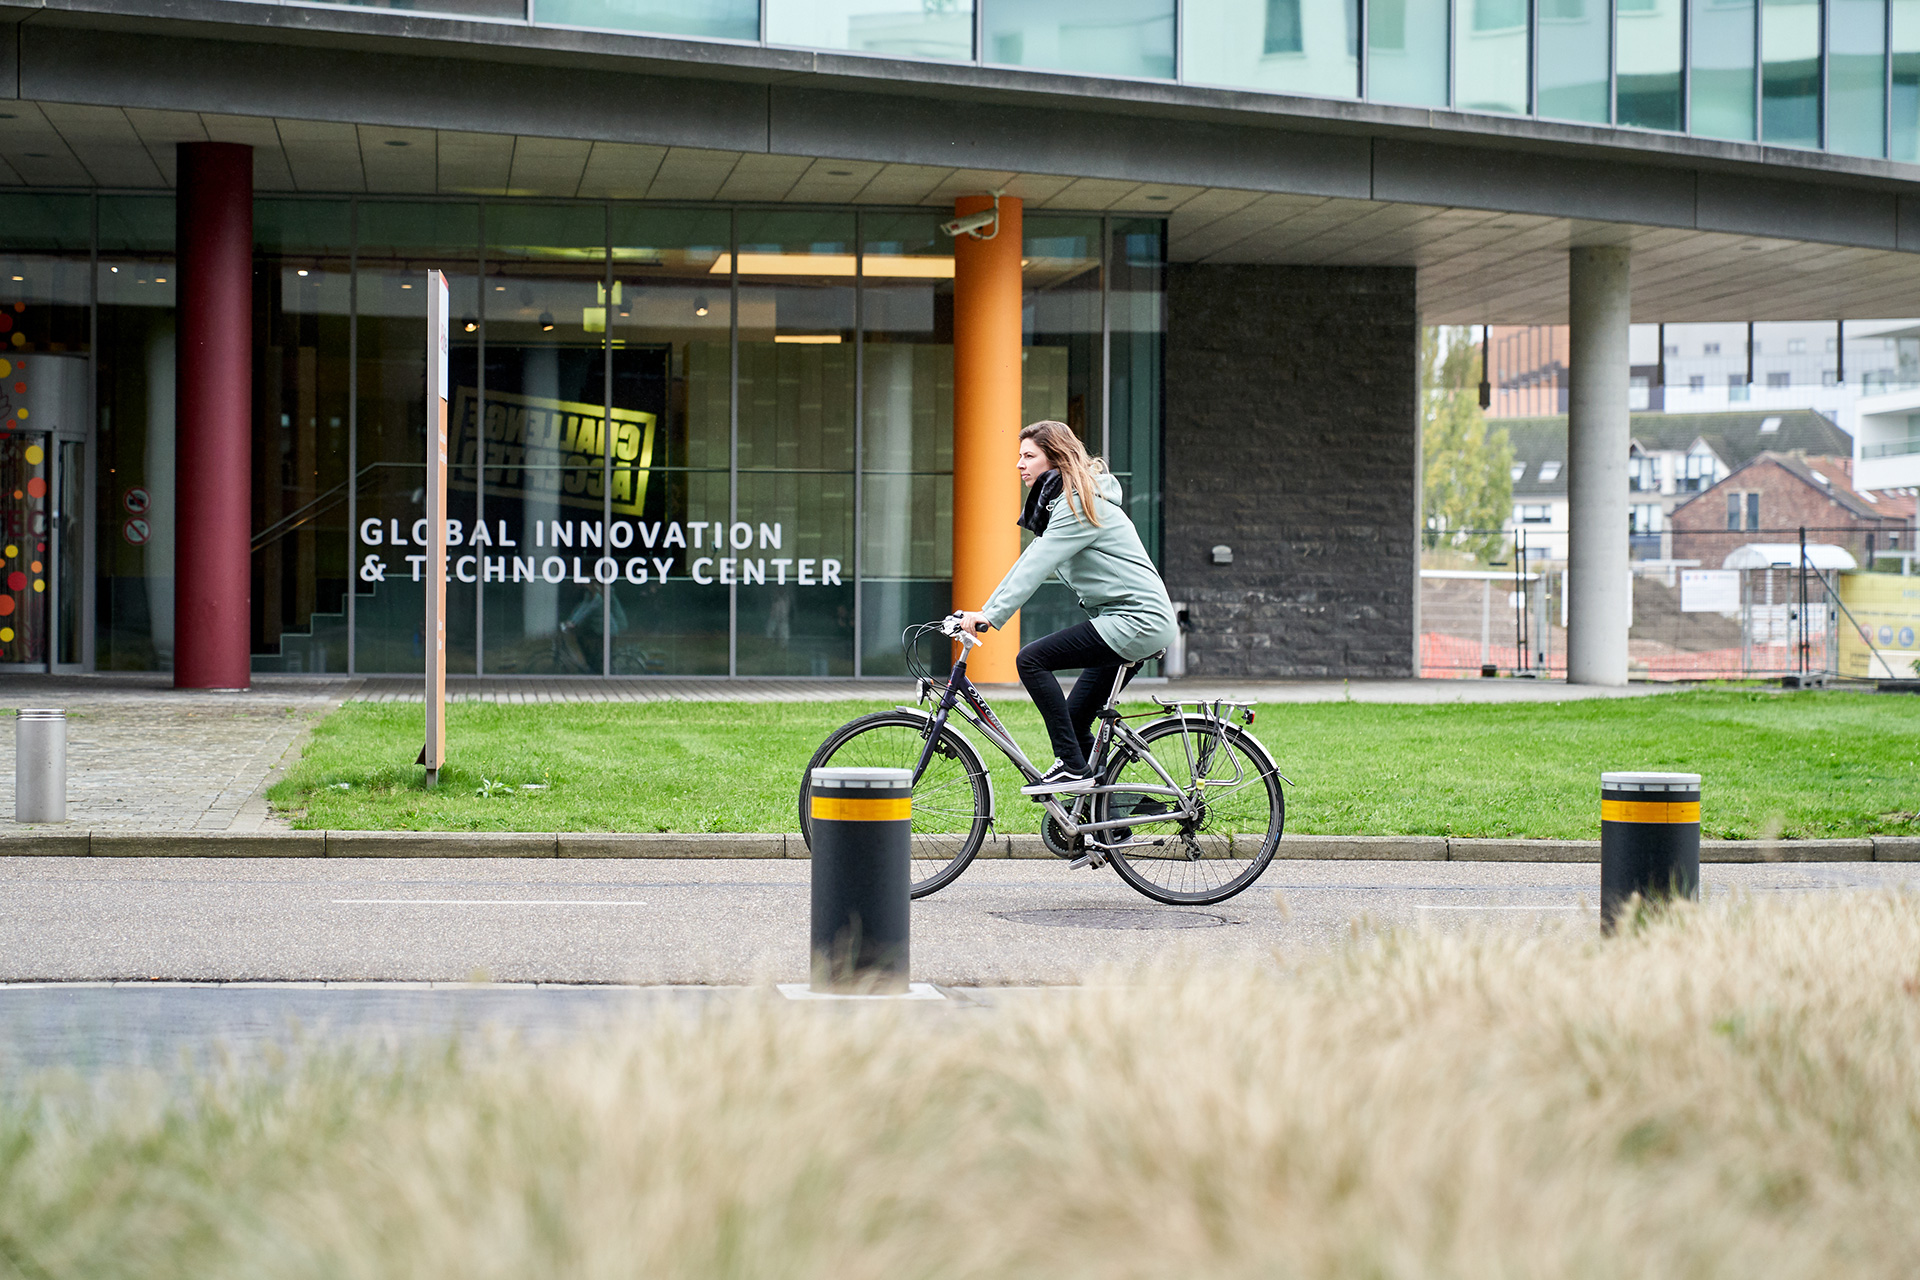 Global Innovation & Technology Center